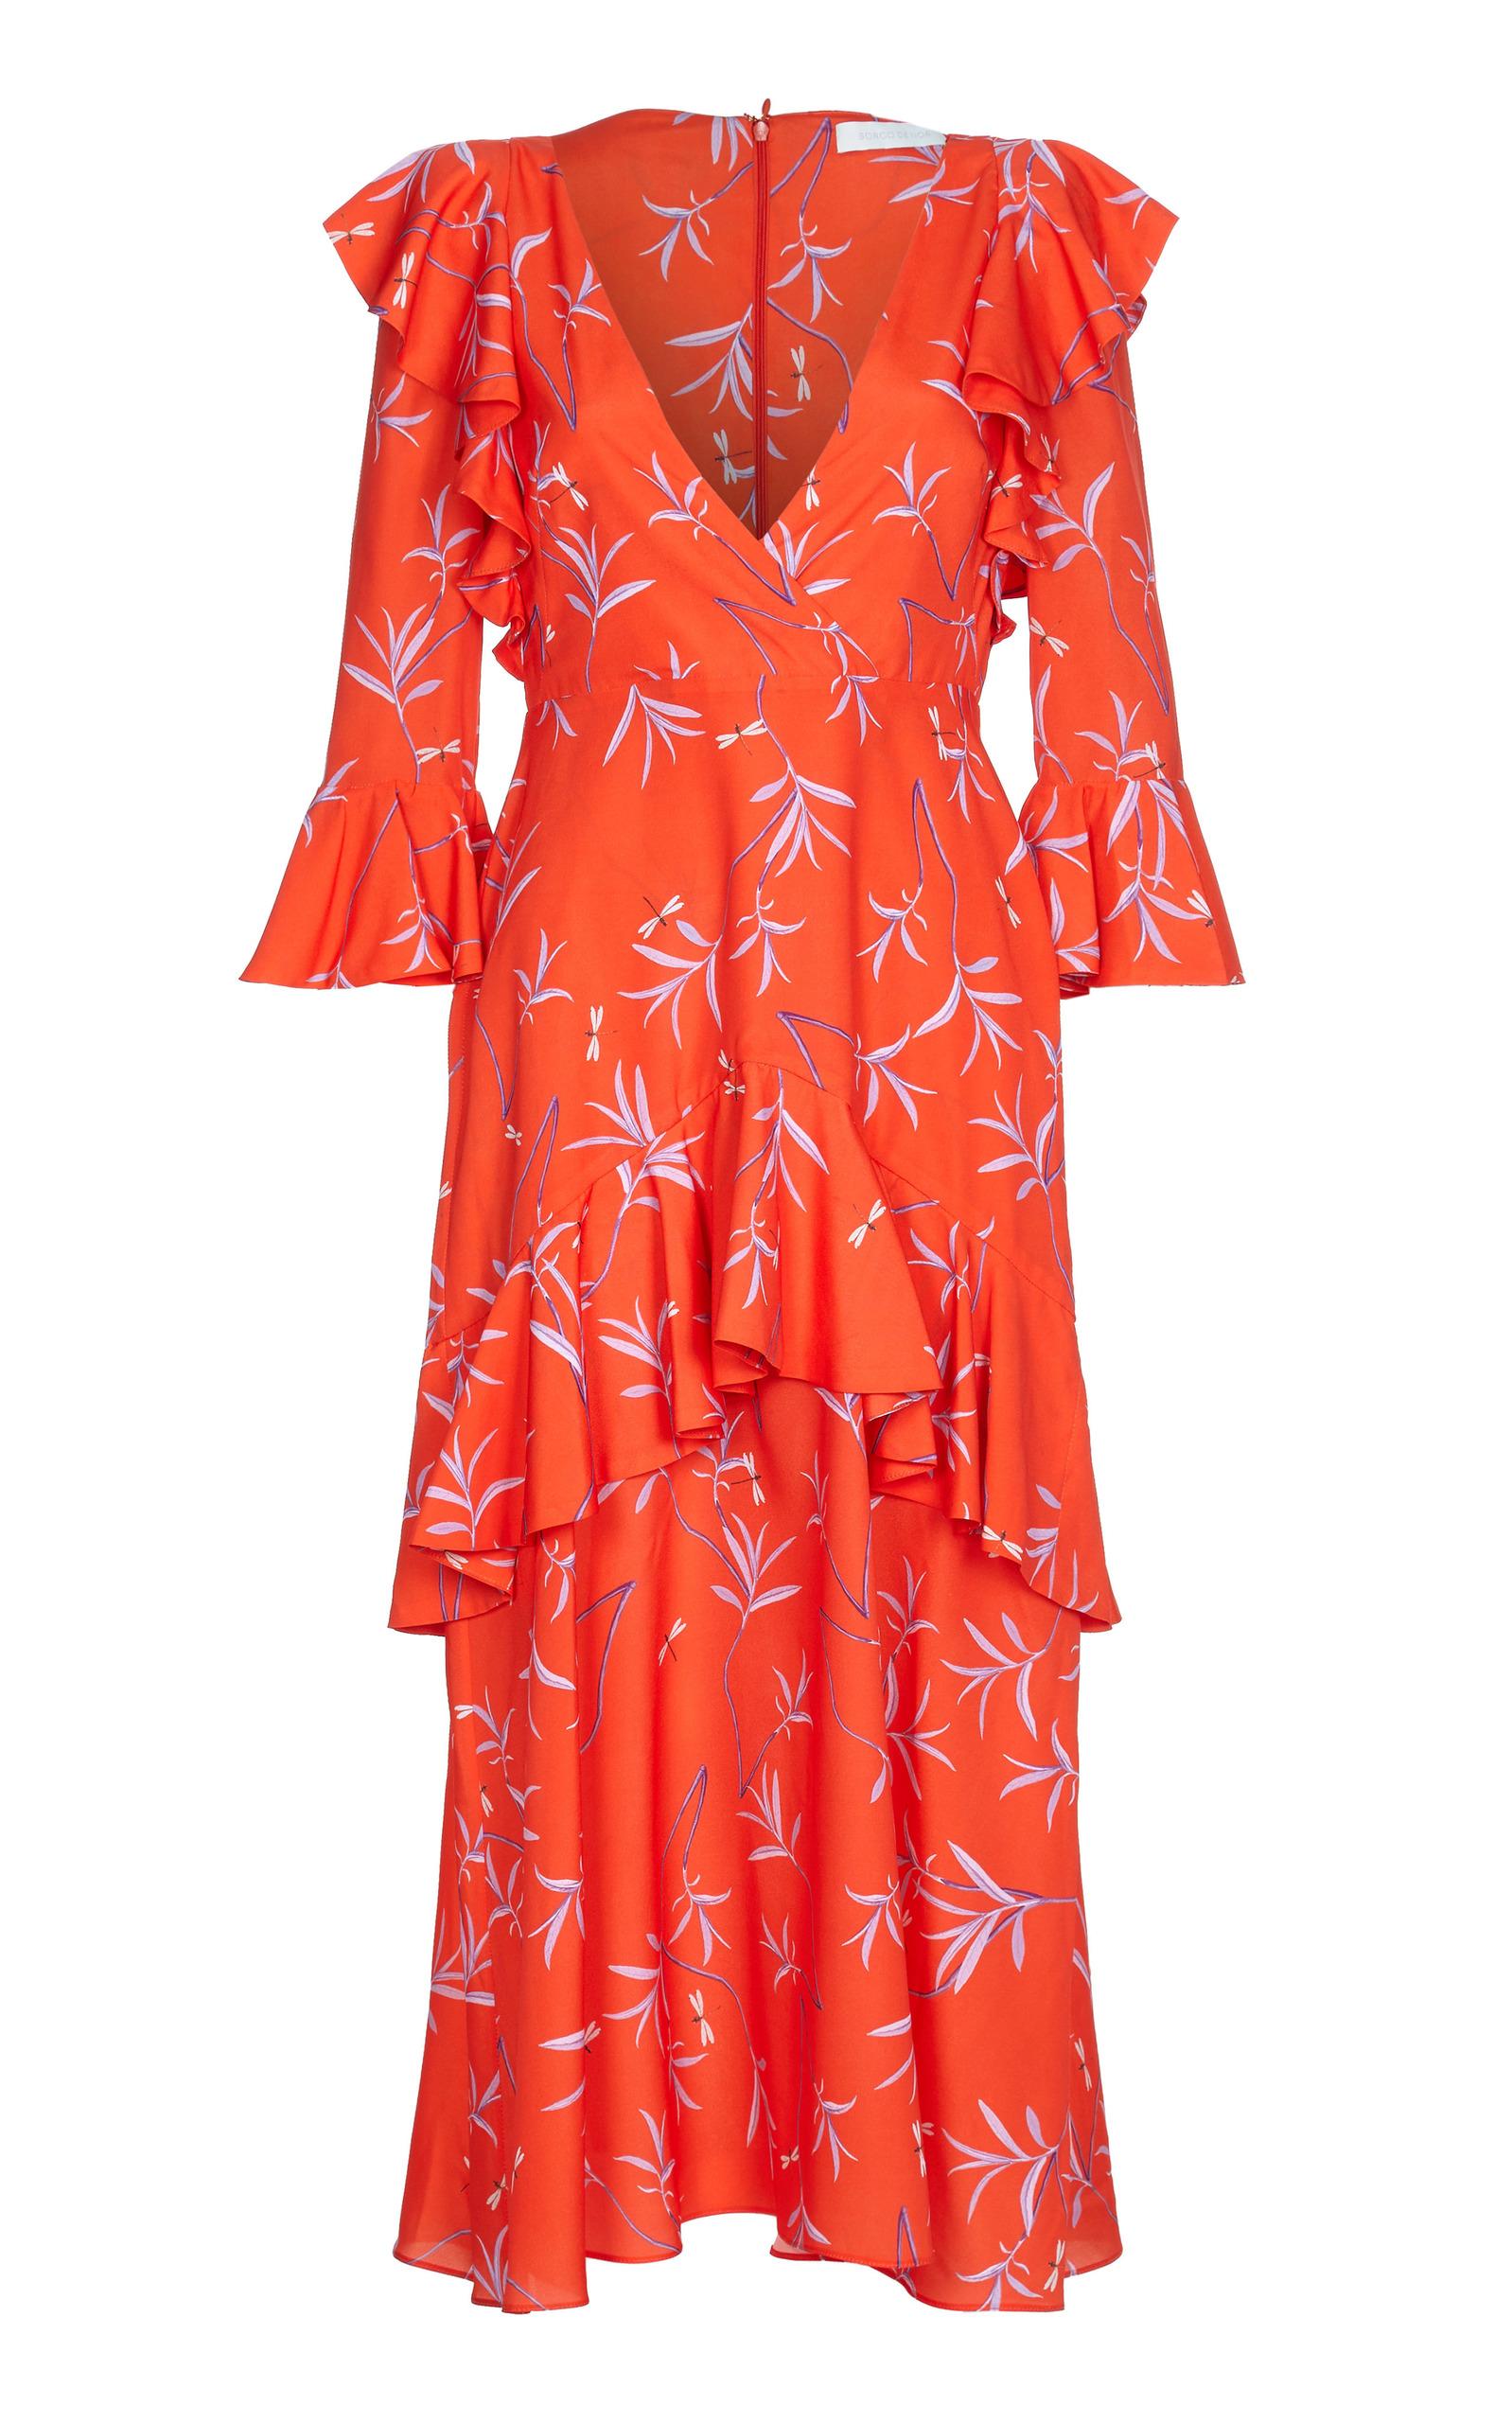 AIANA CREPE DRESS